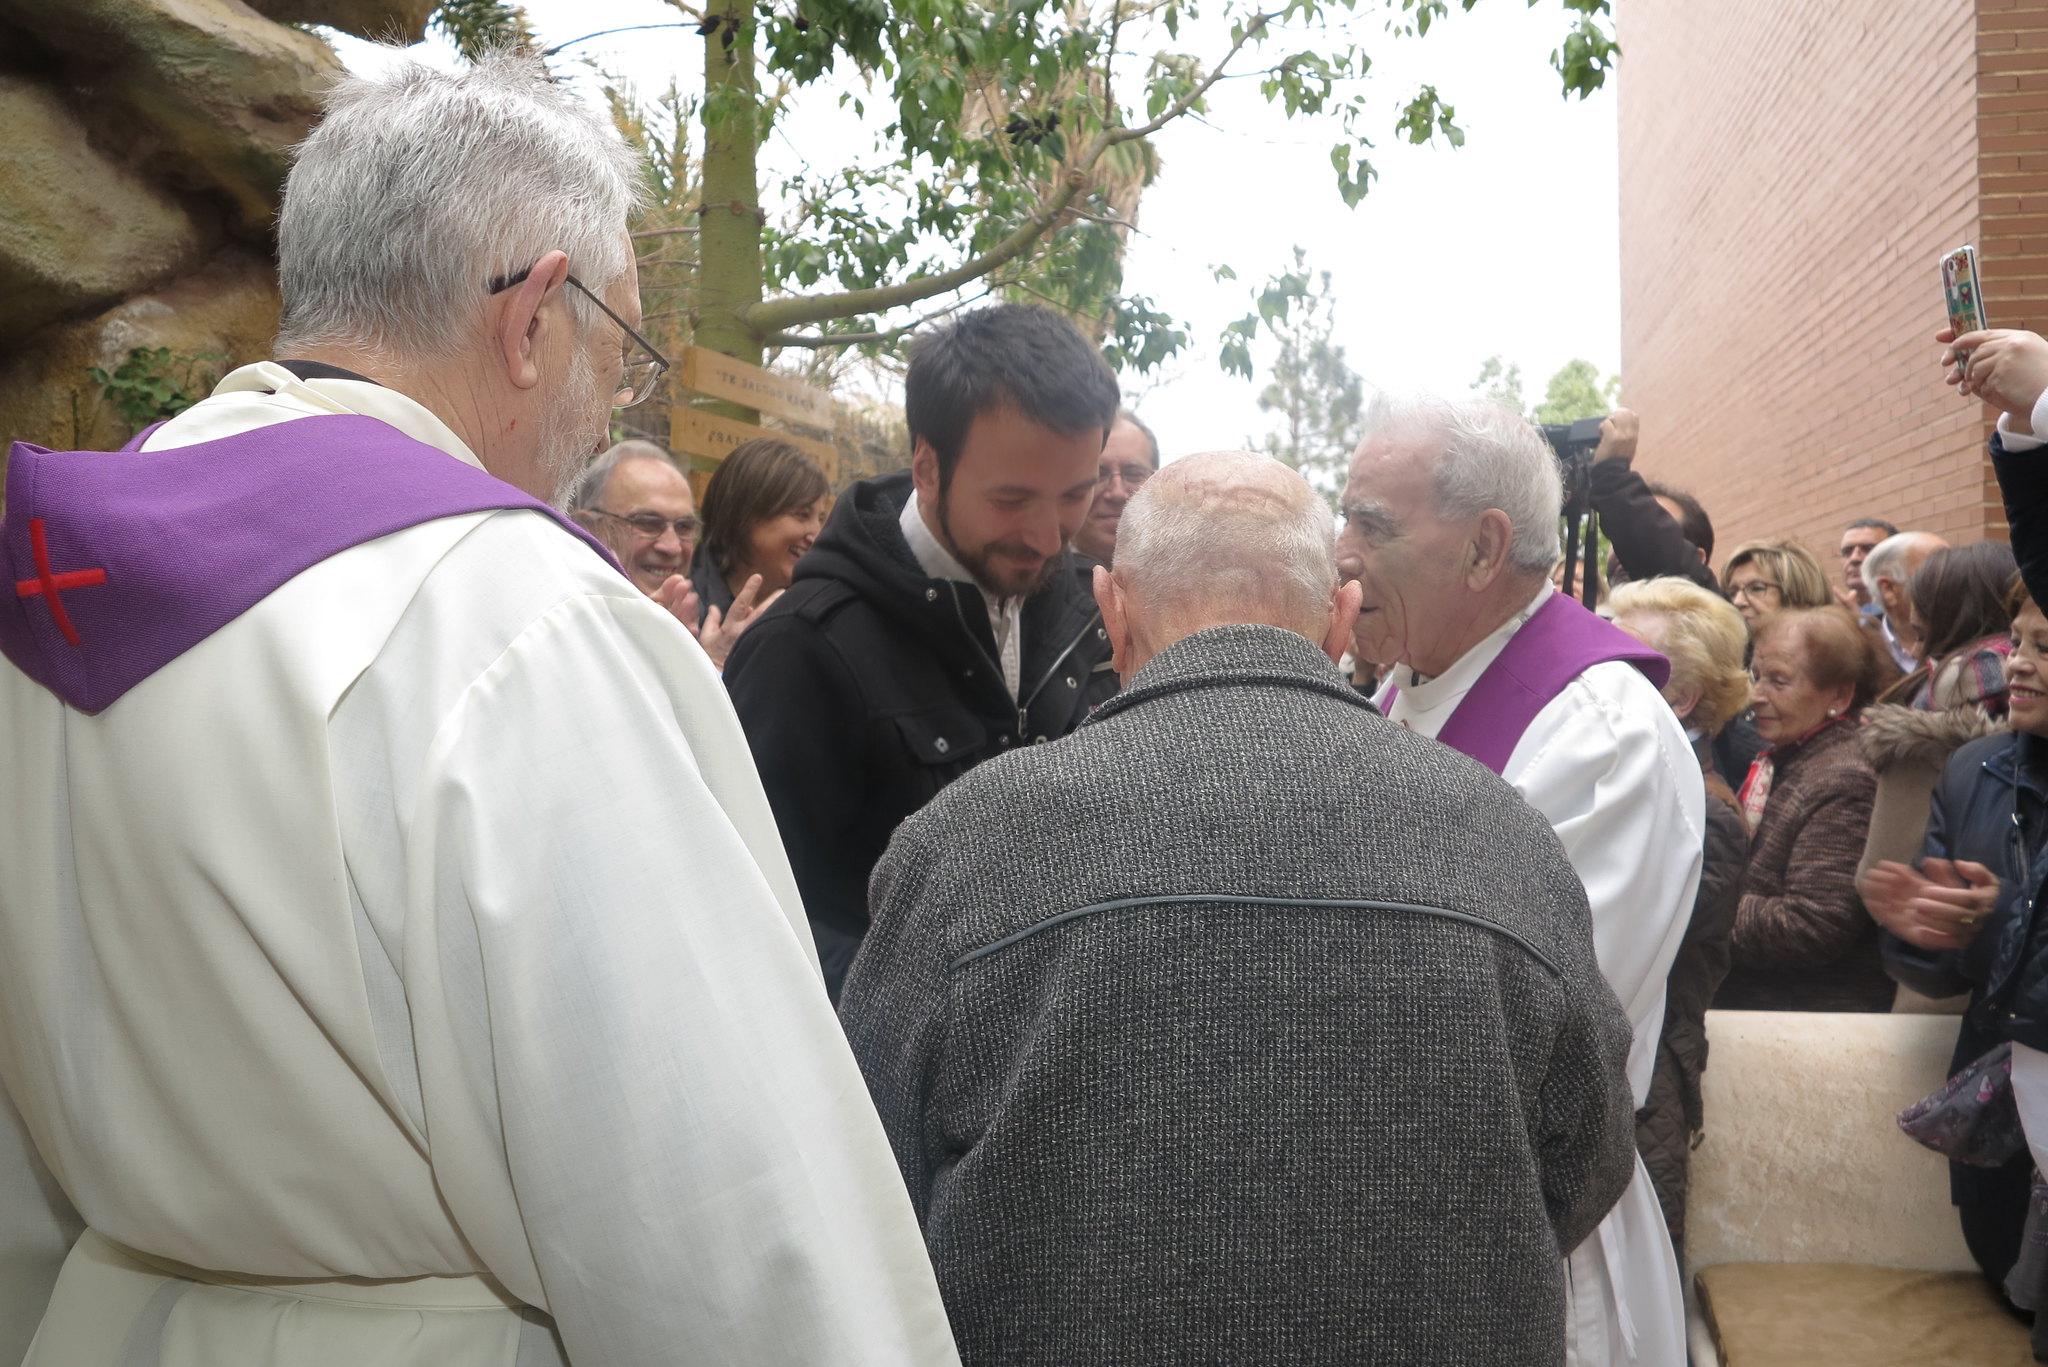 (2016-02-13) - Inauguración Virgen de Lourdes, La Molineta - Archivo La Molineta 2 (59)